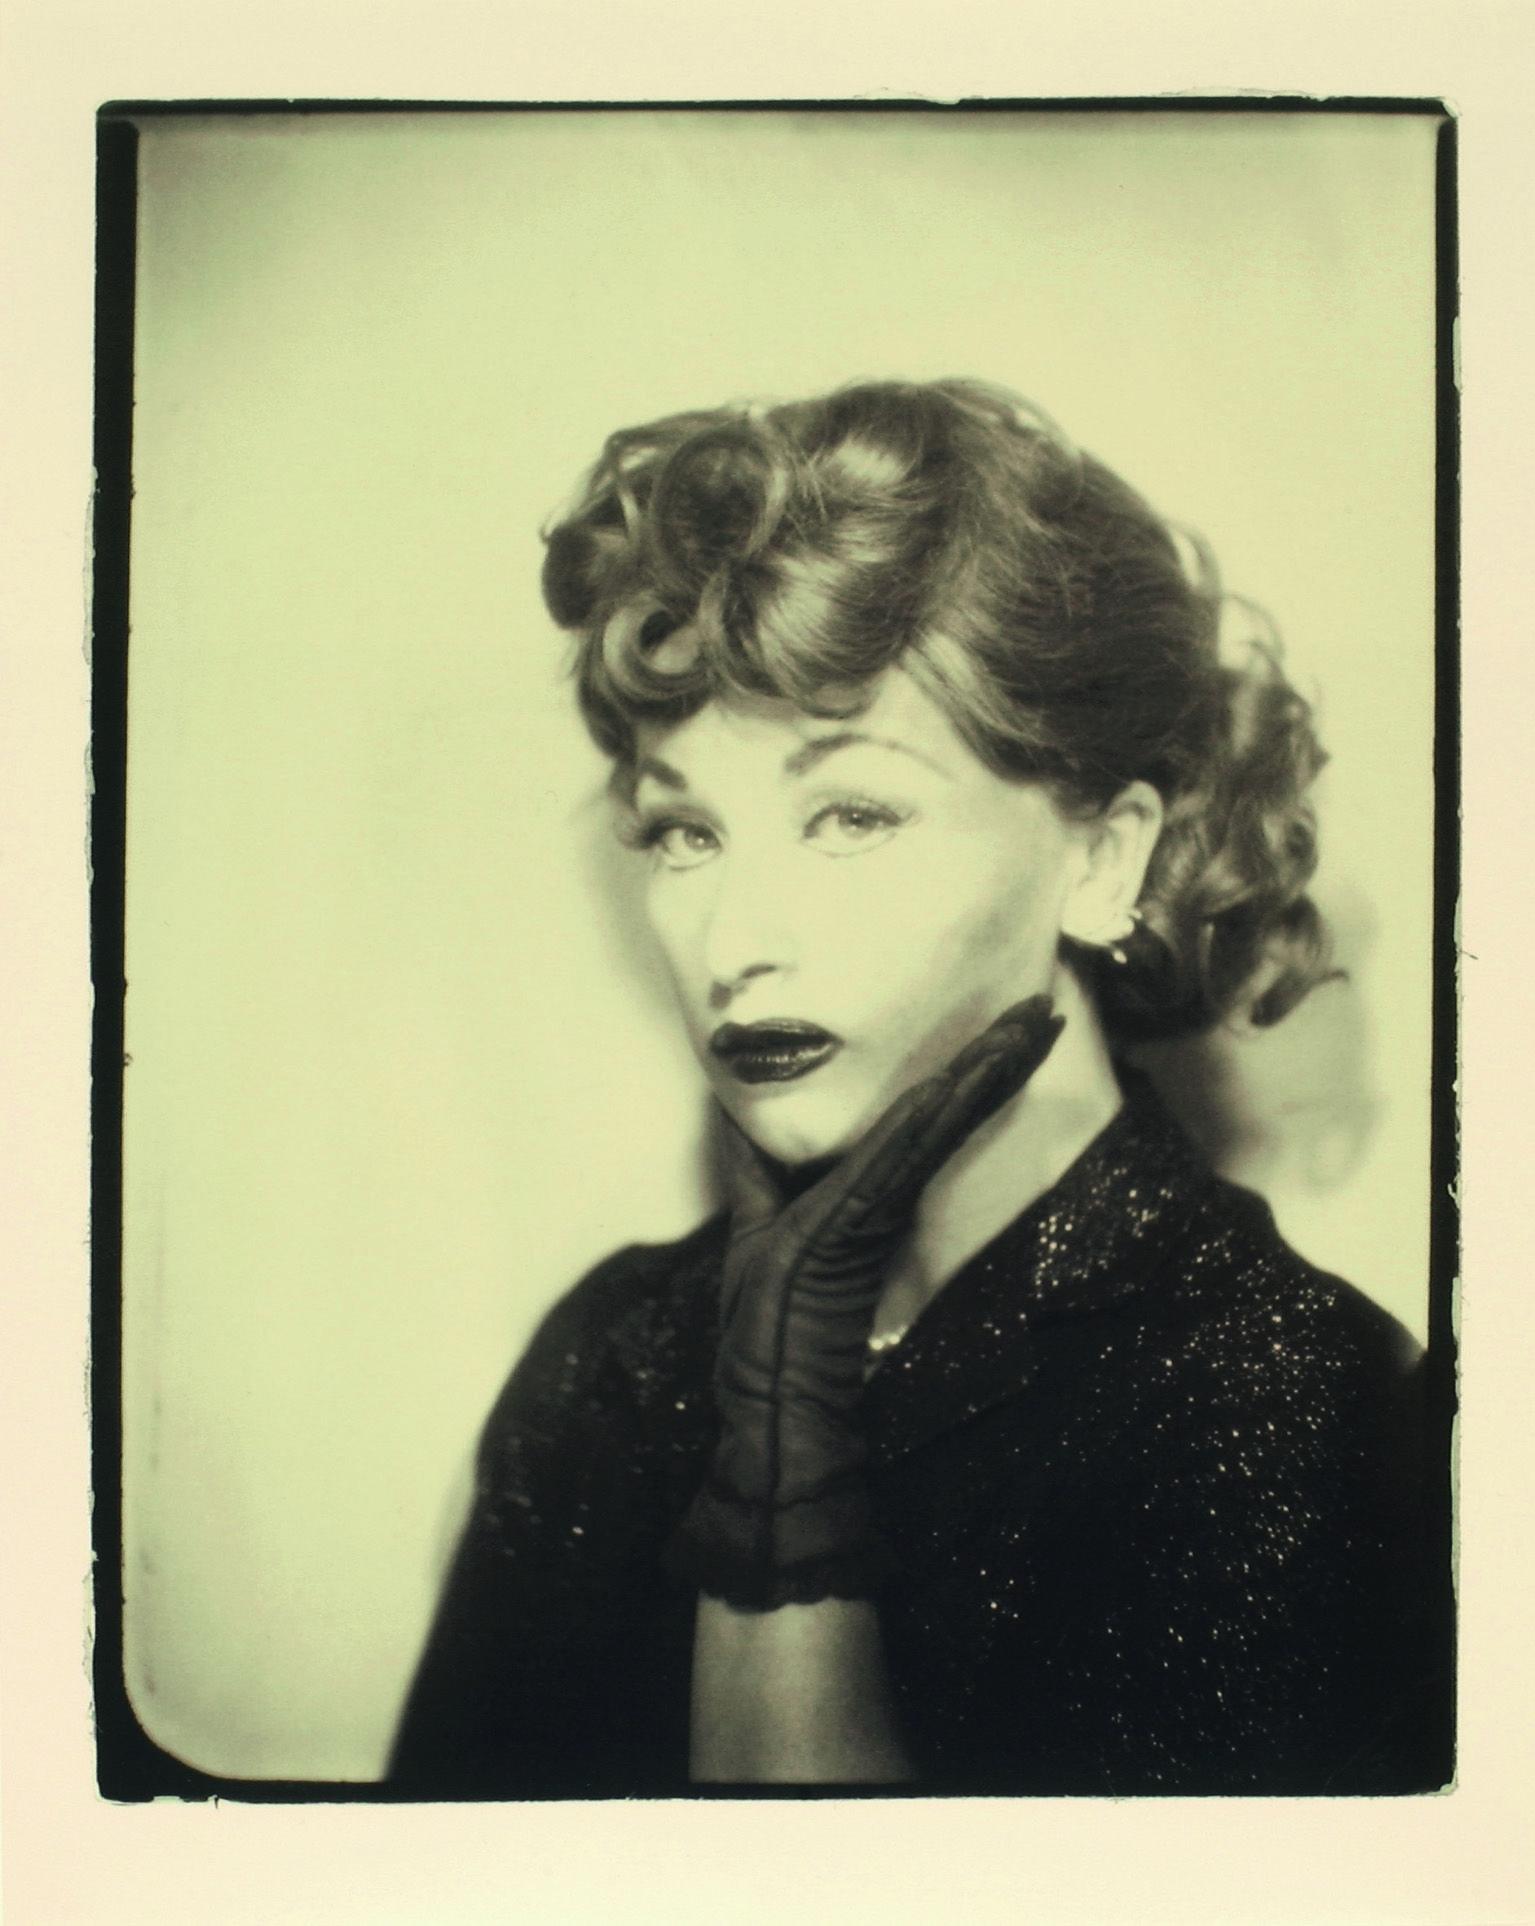 Cindy Sherman - Lucille Ball, 1975